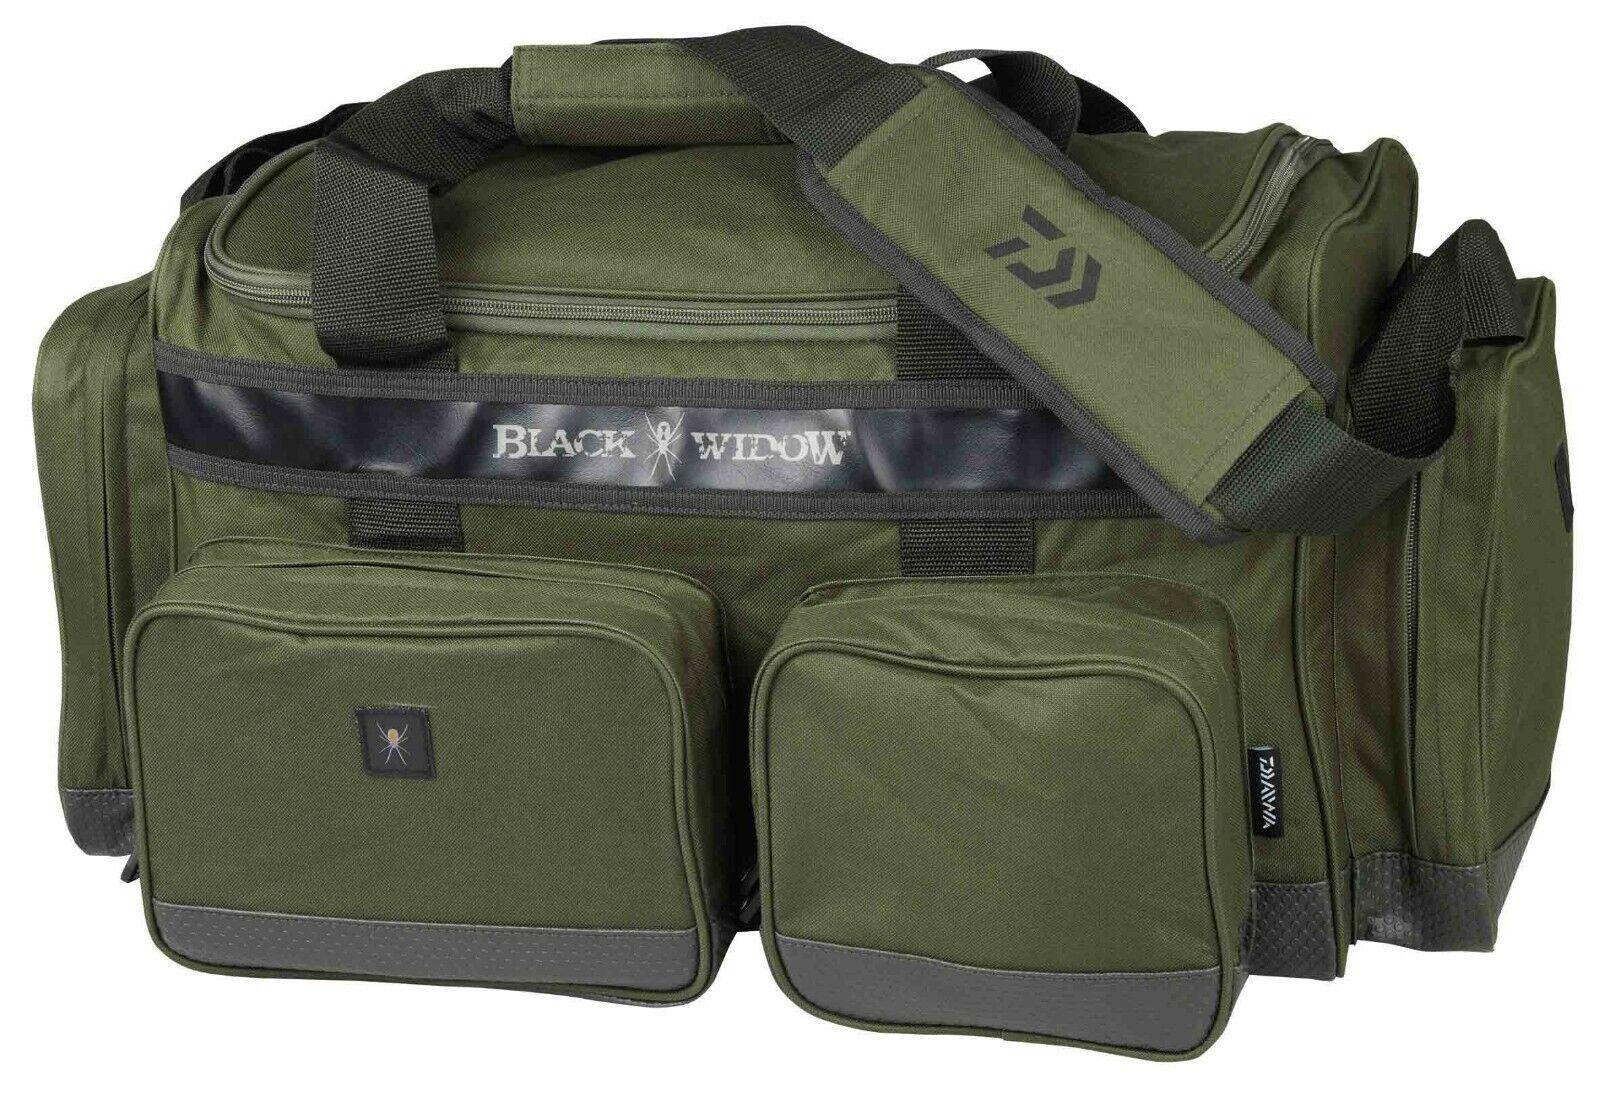 Daiwa schwarz Widow Carryall 60 x 32 x 40cm Carryall-Tasche 18705-070